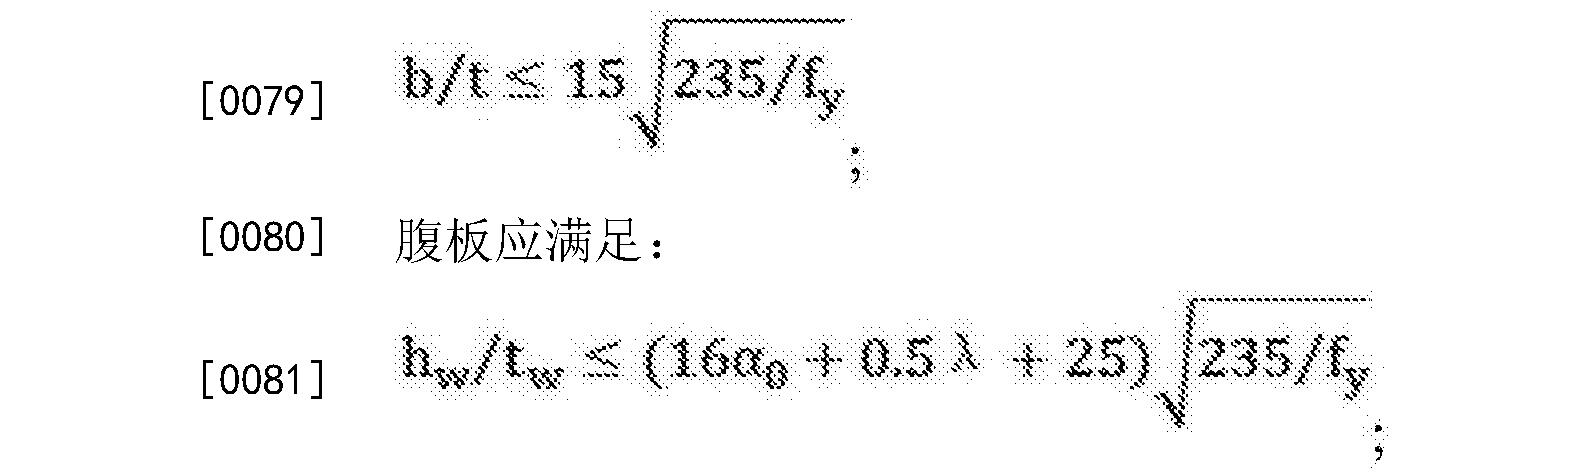 Figure CN105625570AD00091